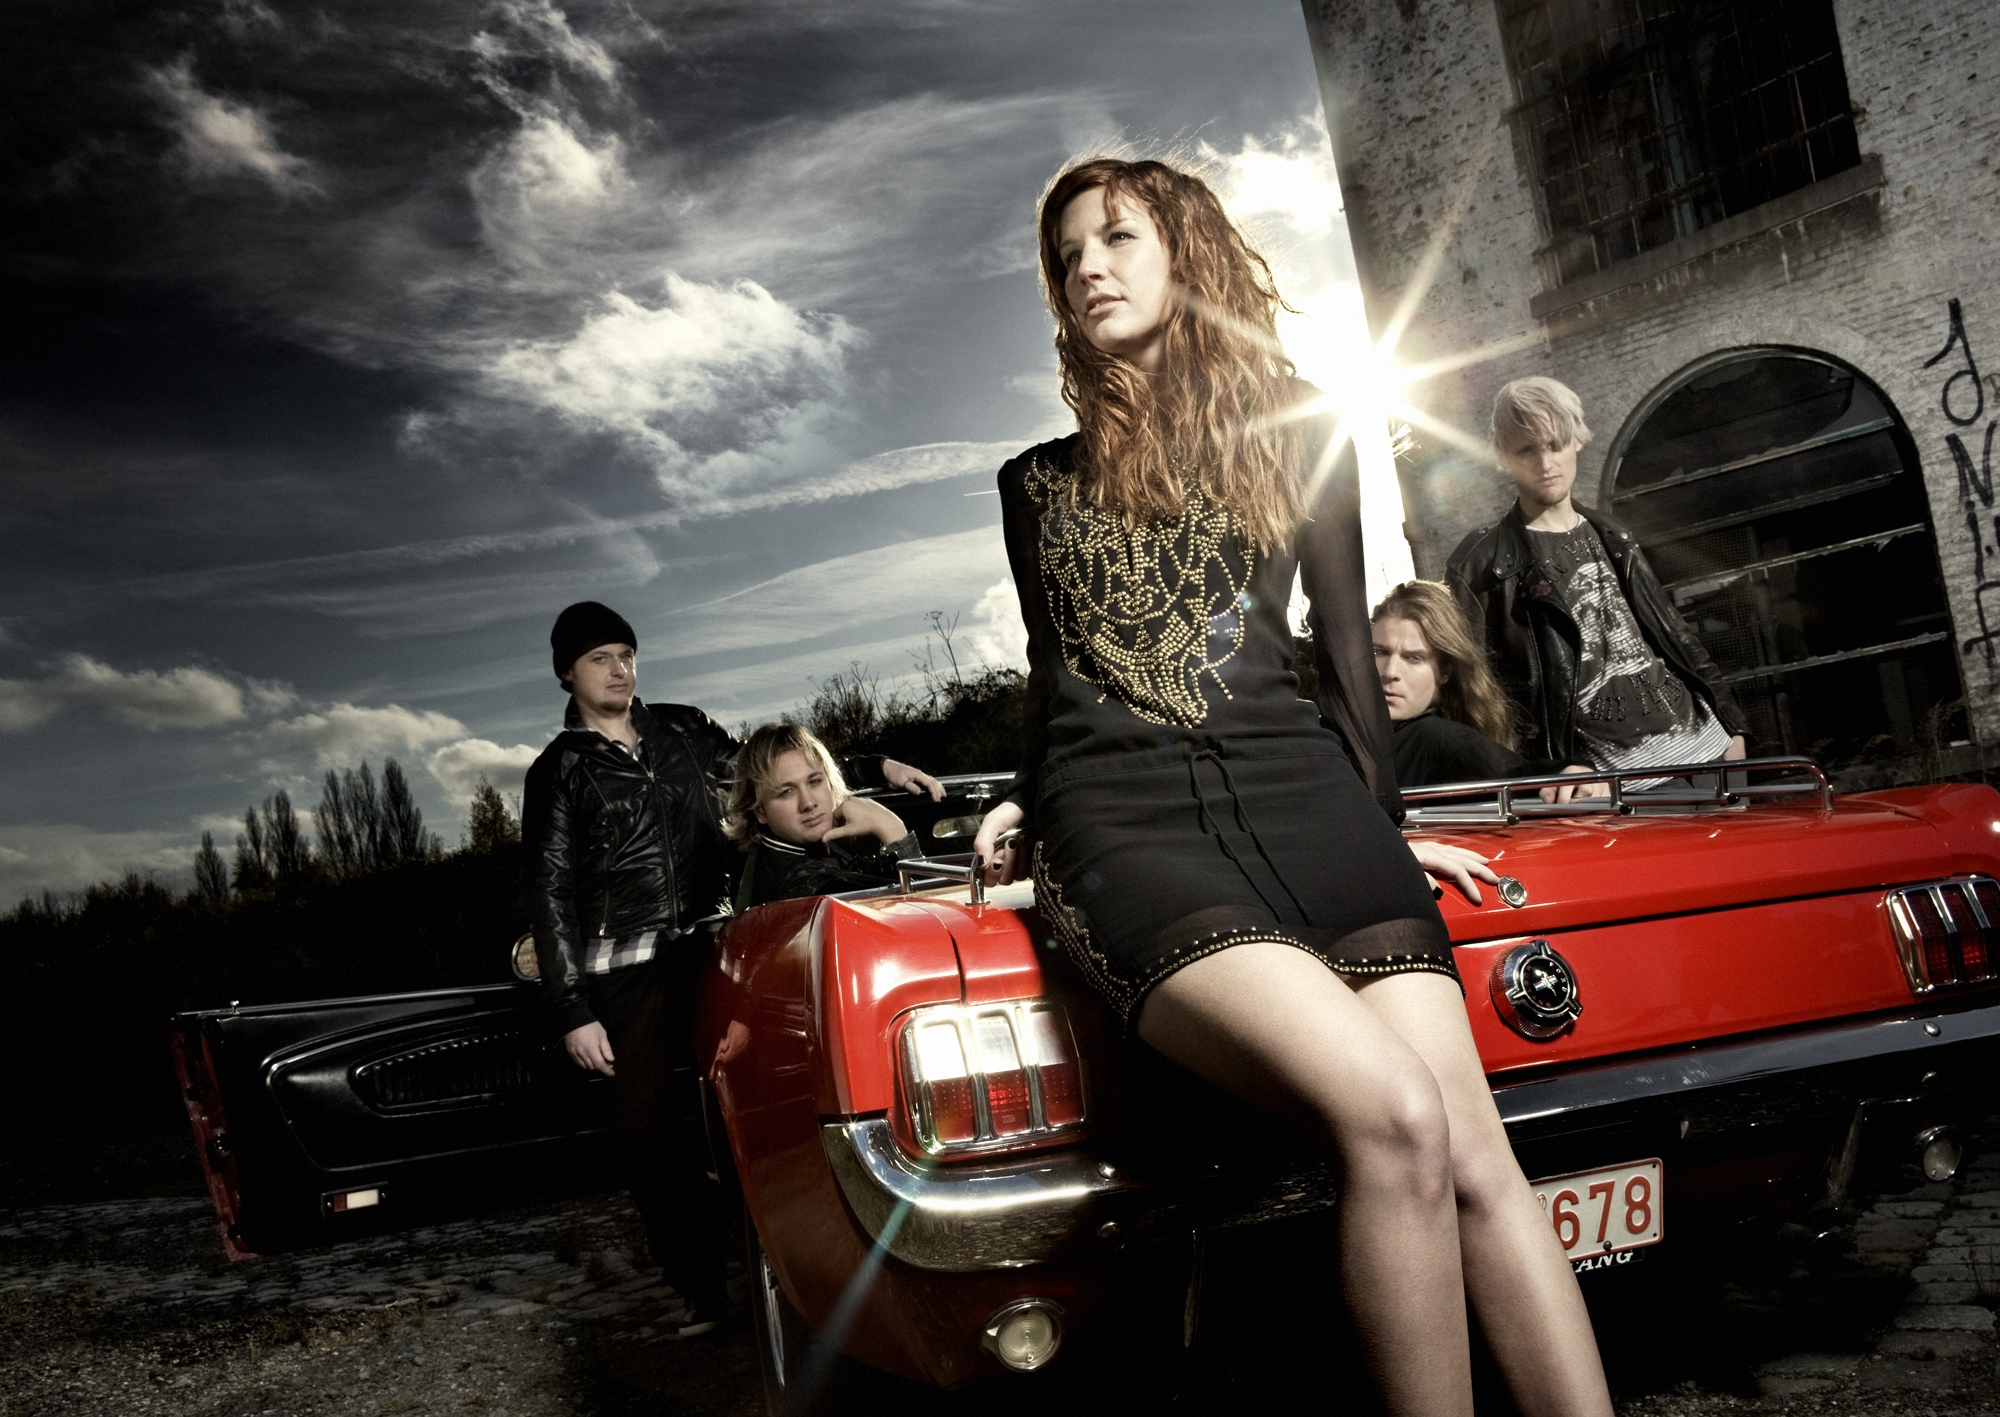 Delain Promo Bild 2011